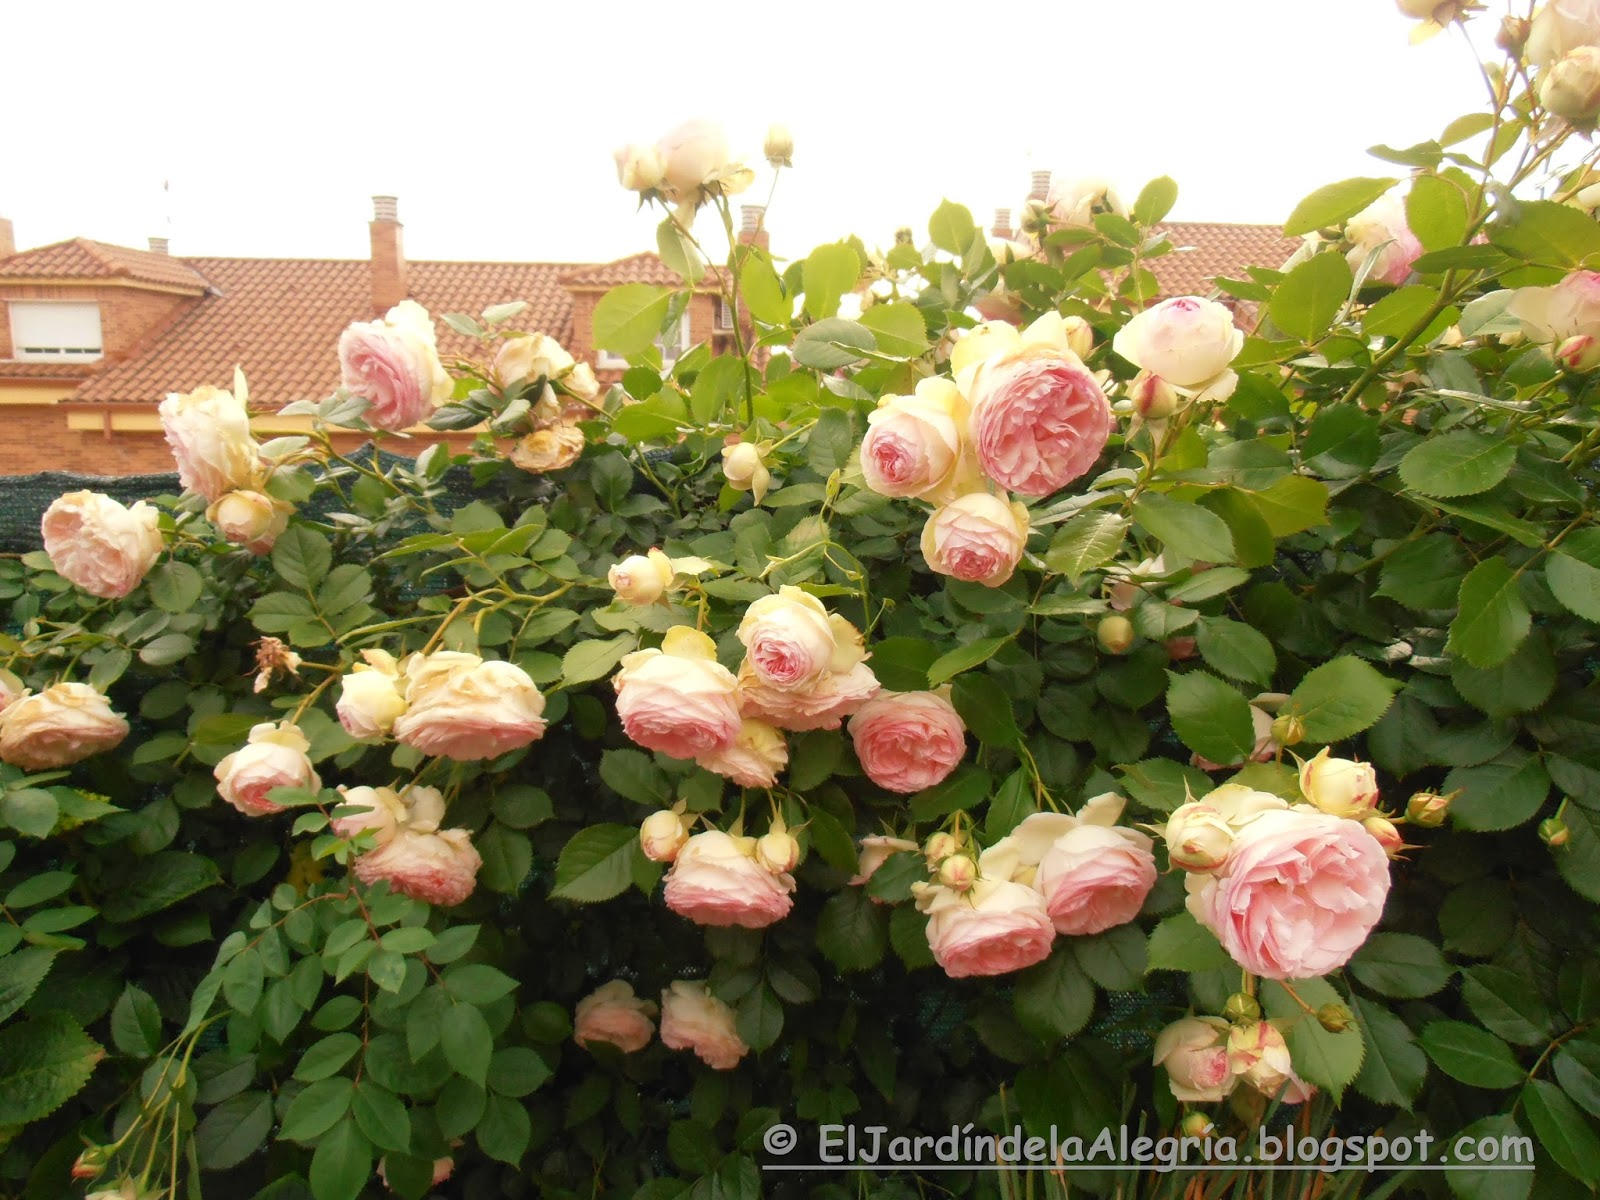 El jard n de la alegr a c mo se podan los rosales - Rosales en macetas ...